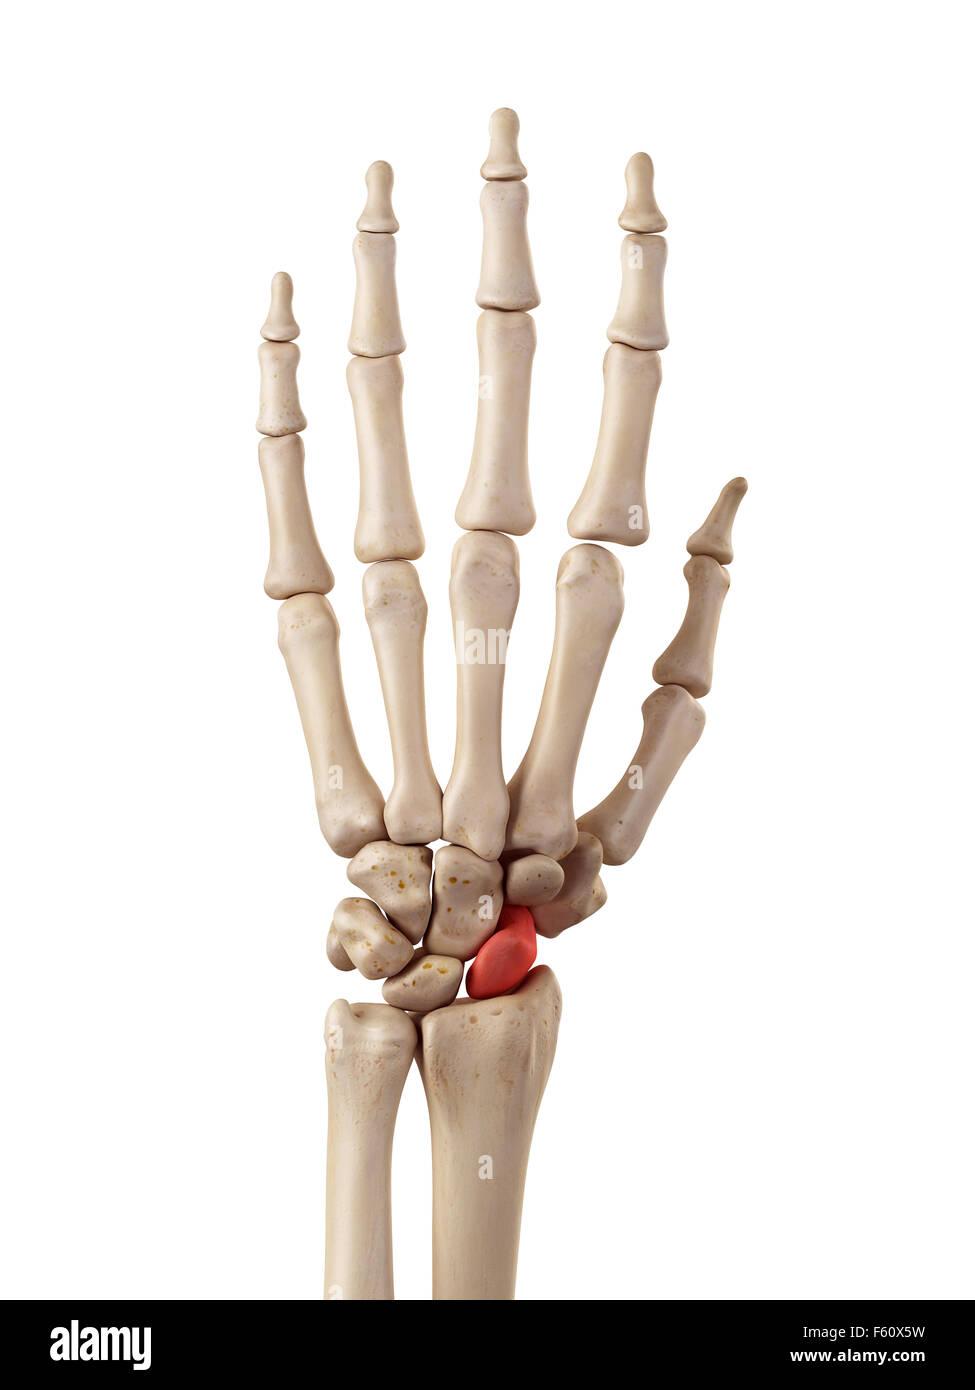 Scaphoid Bone Stock Photos & Scaphoid Bone Stock Images - Alamy